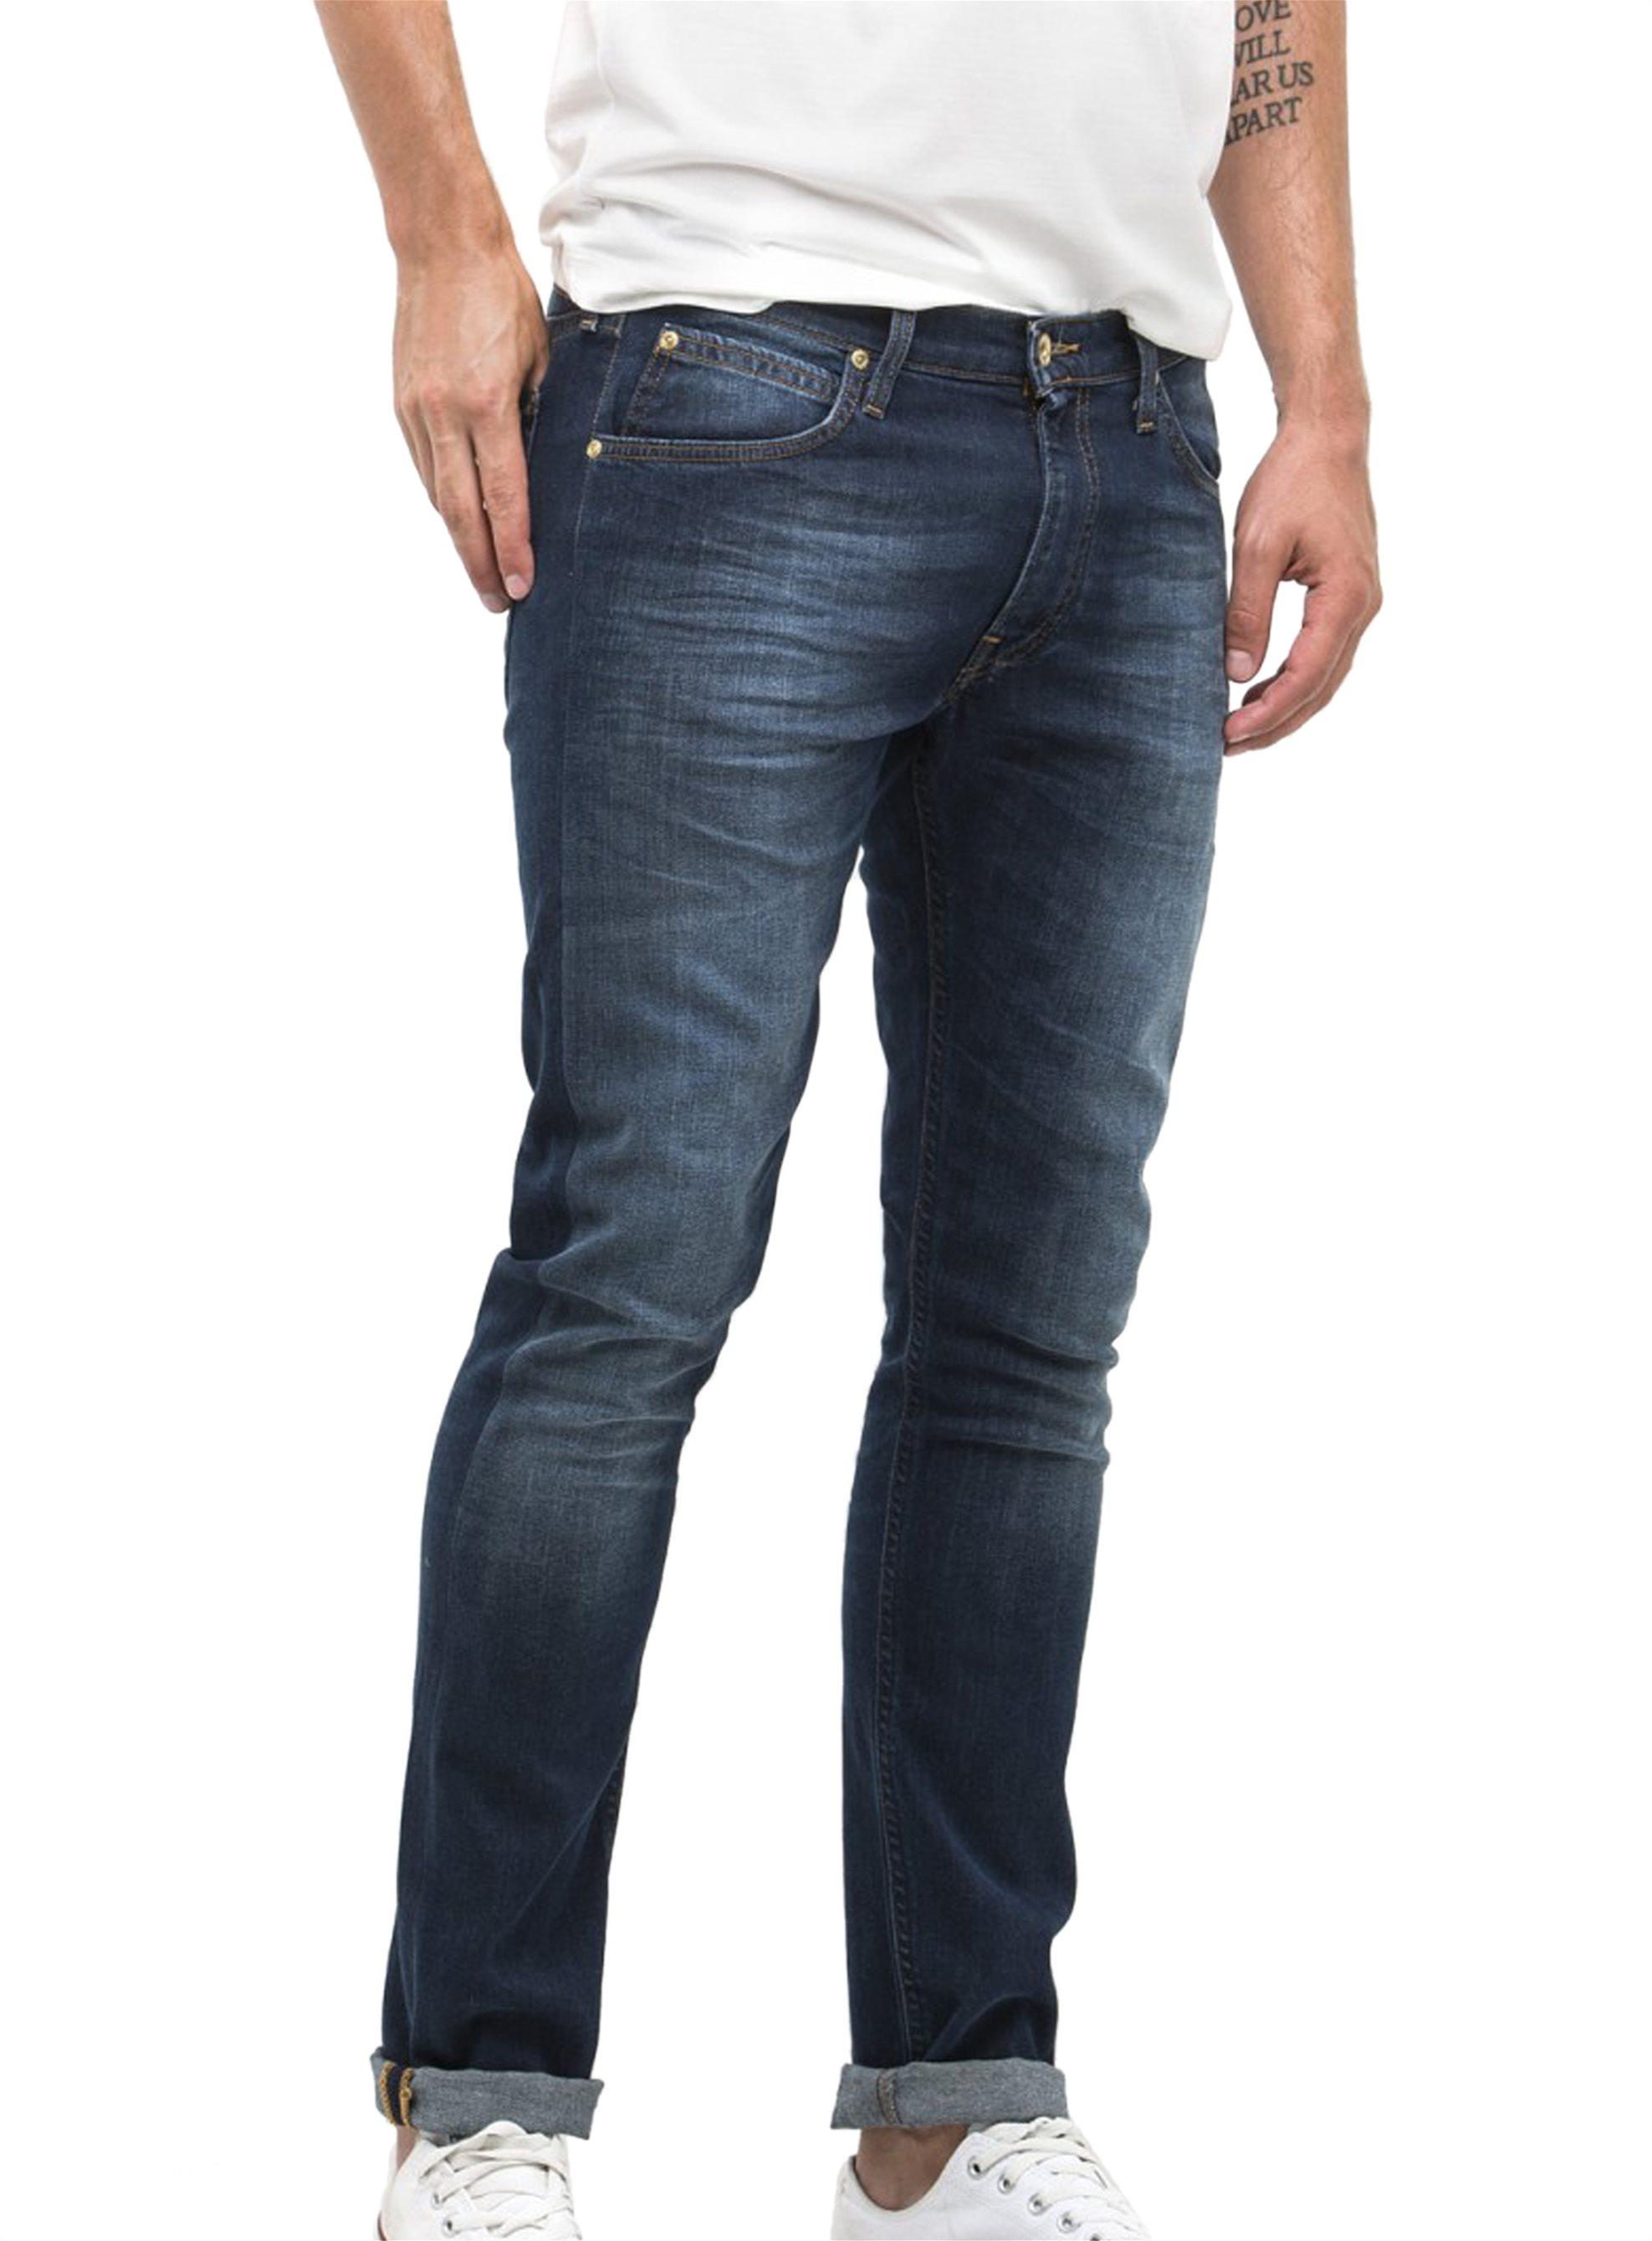 Lee Luke Slim Tapered ανδρικό τζην παντελόνι True Authentic - L719GCBY - Μπλε Σκ ανδρασ   ρουχα   jeans   slim   tapered